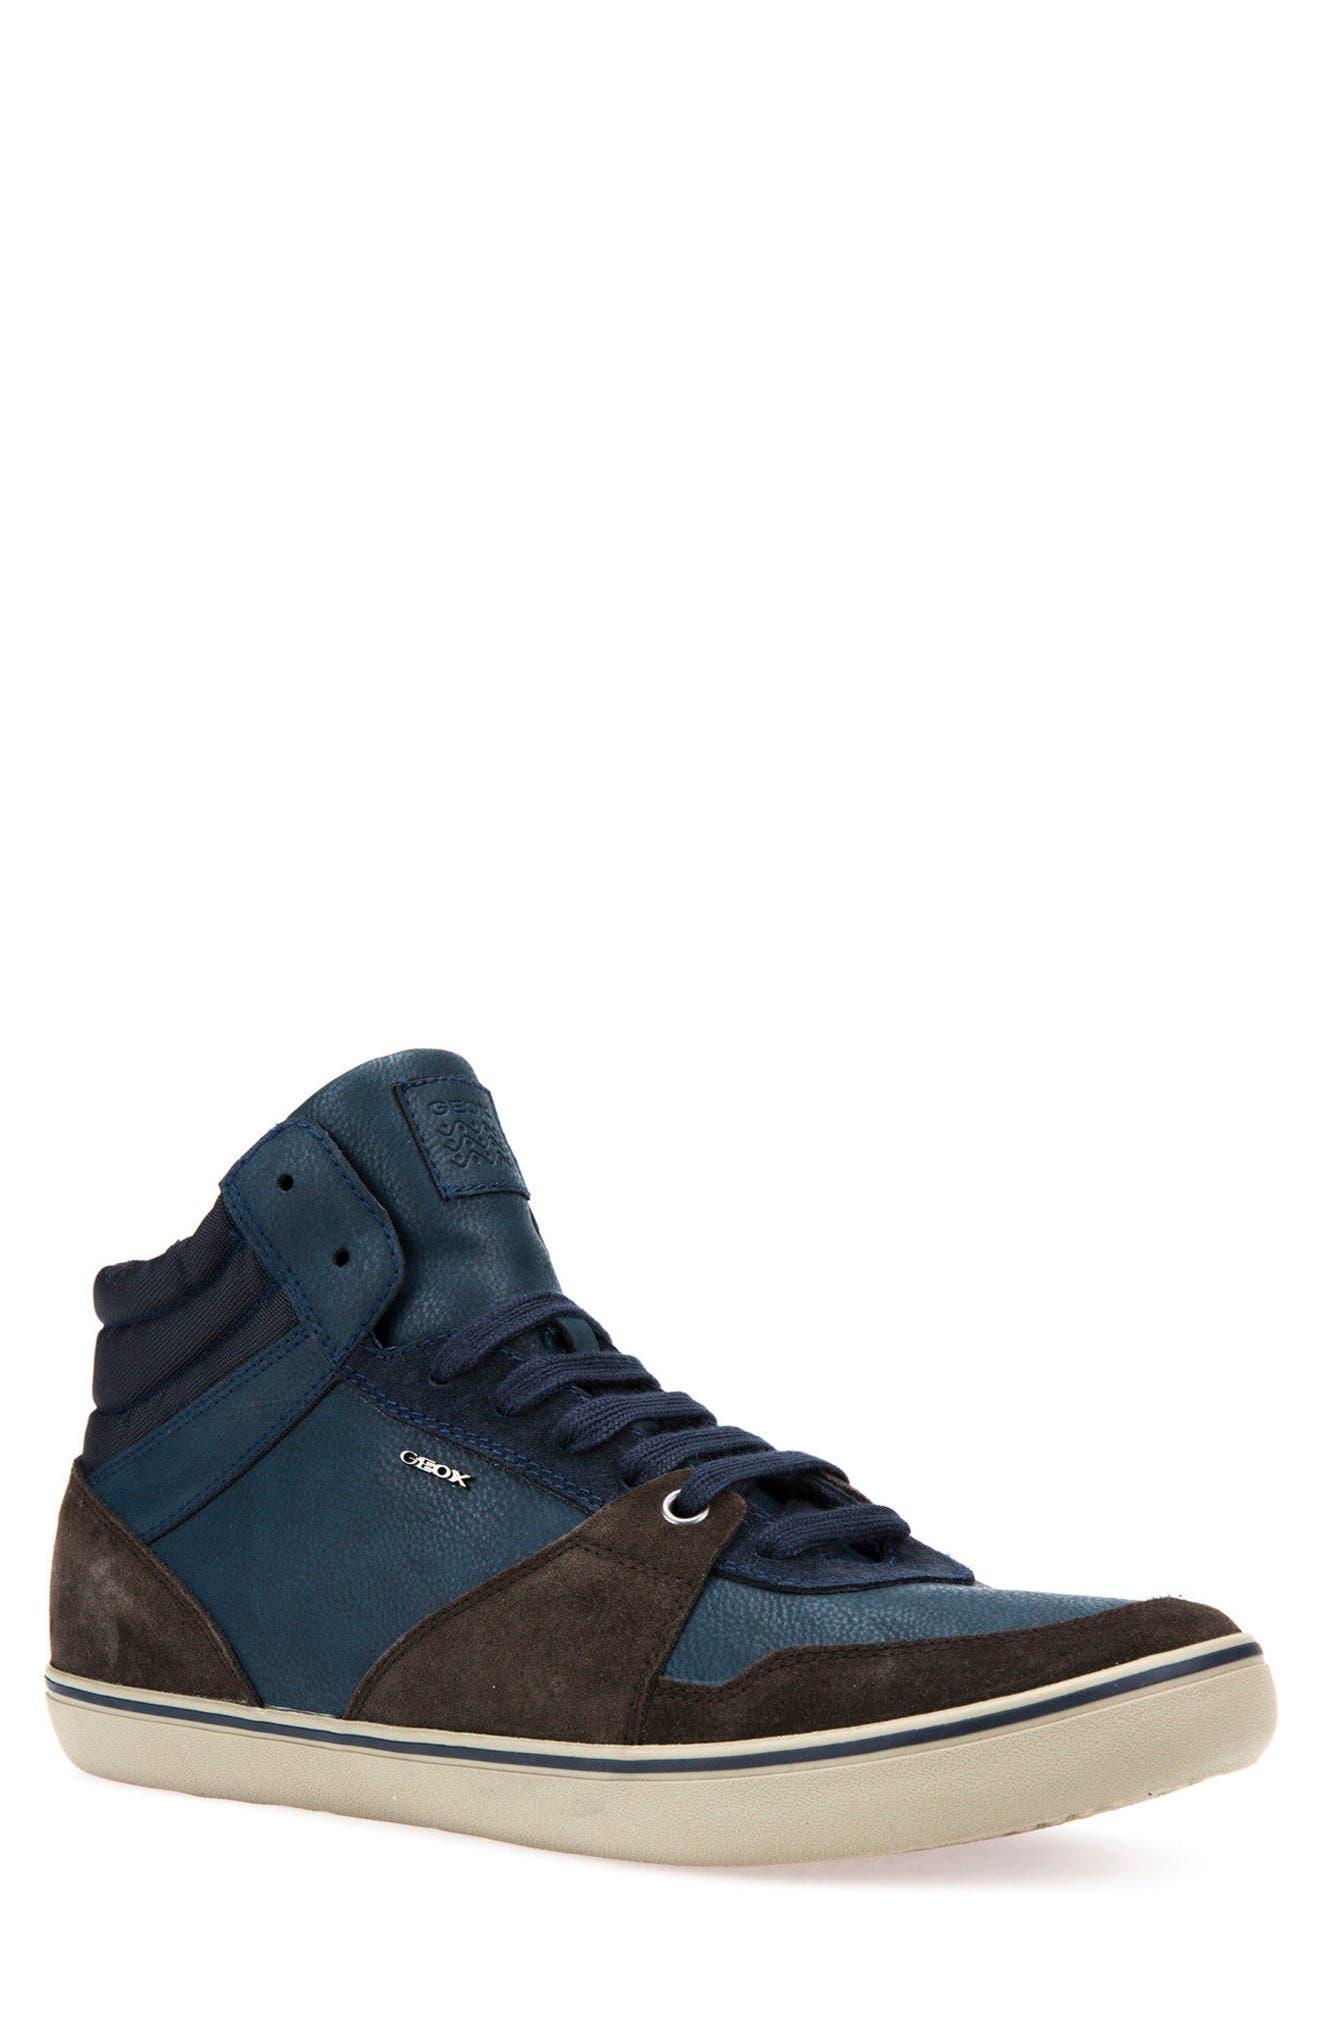 Geox Box 29 High Top Sneaker (Men)